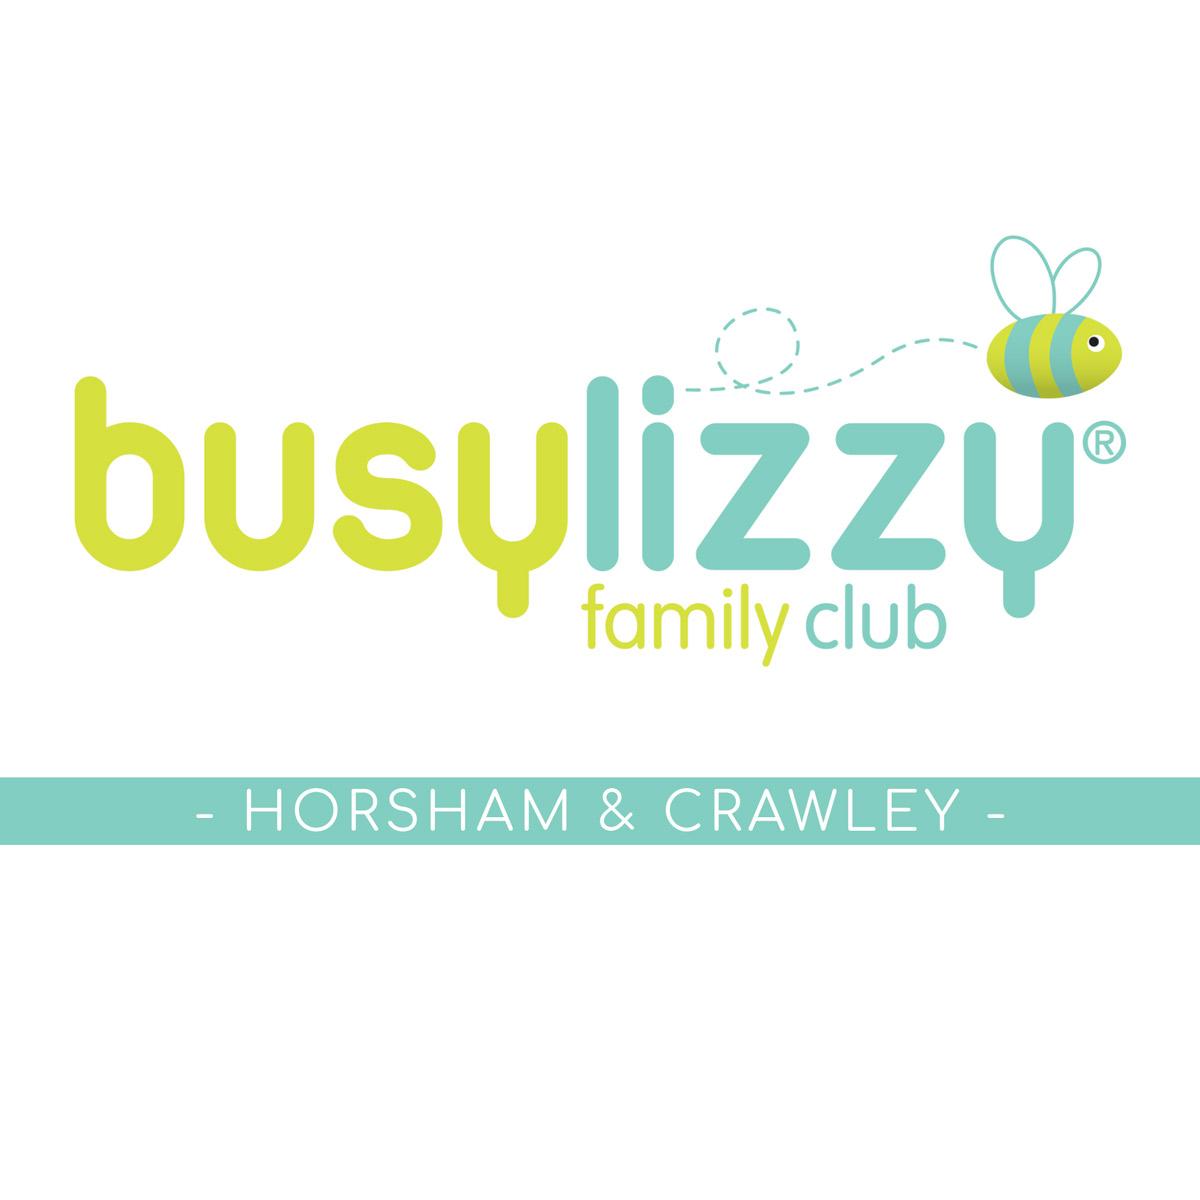 Busy Lizzy pregnancy fitness class Horsham & Crawley